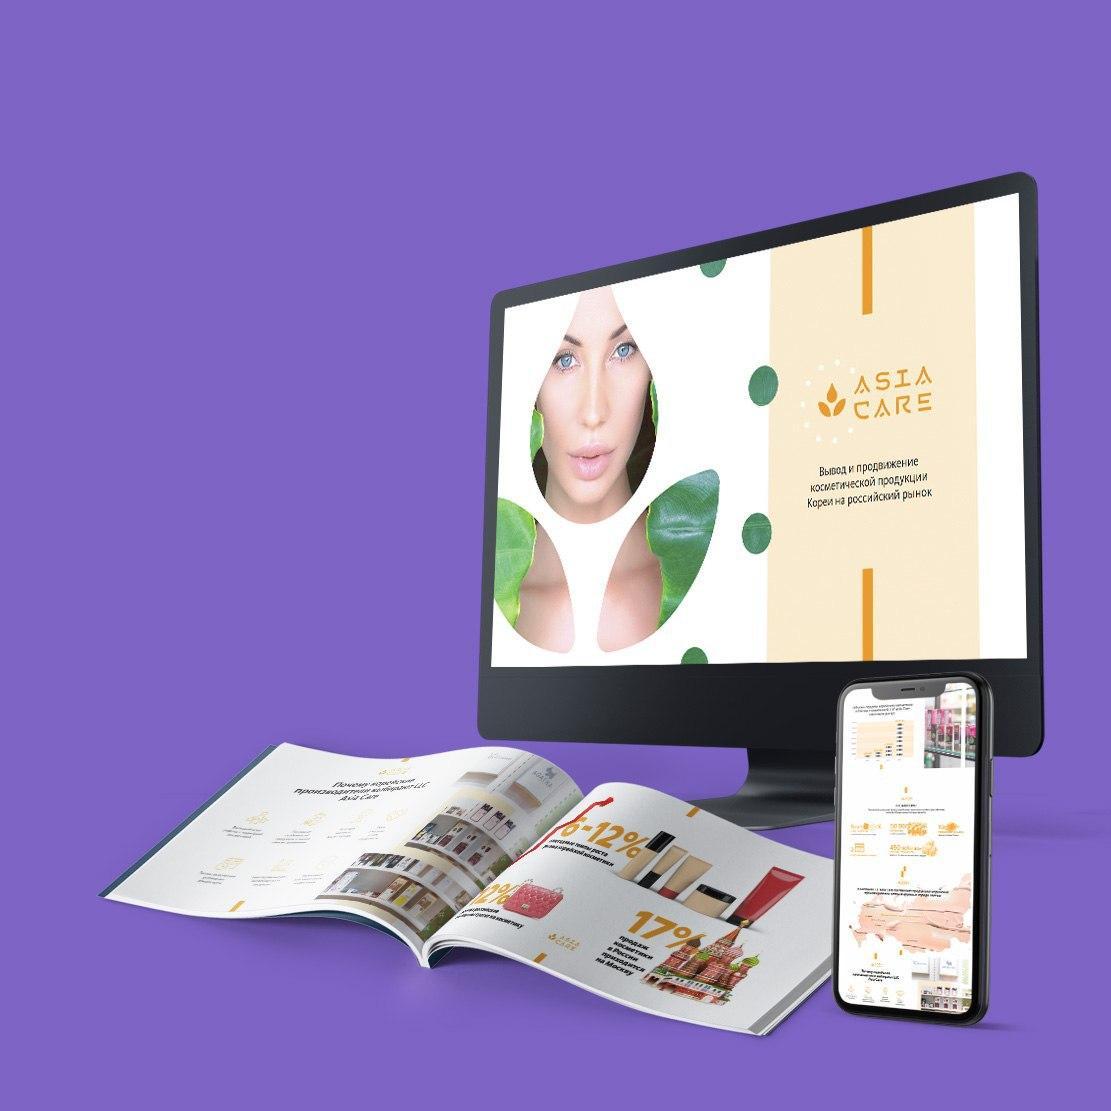 Презентация косметической компании Asia Care